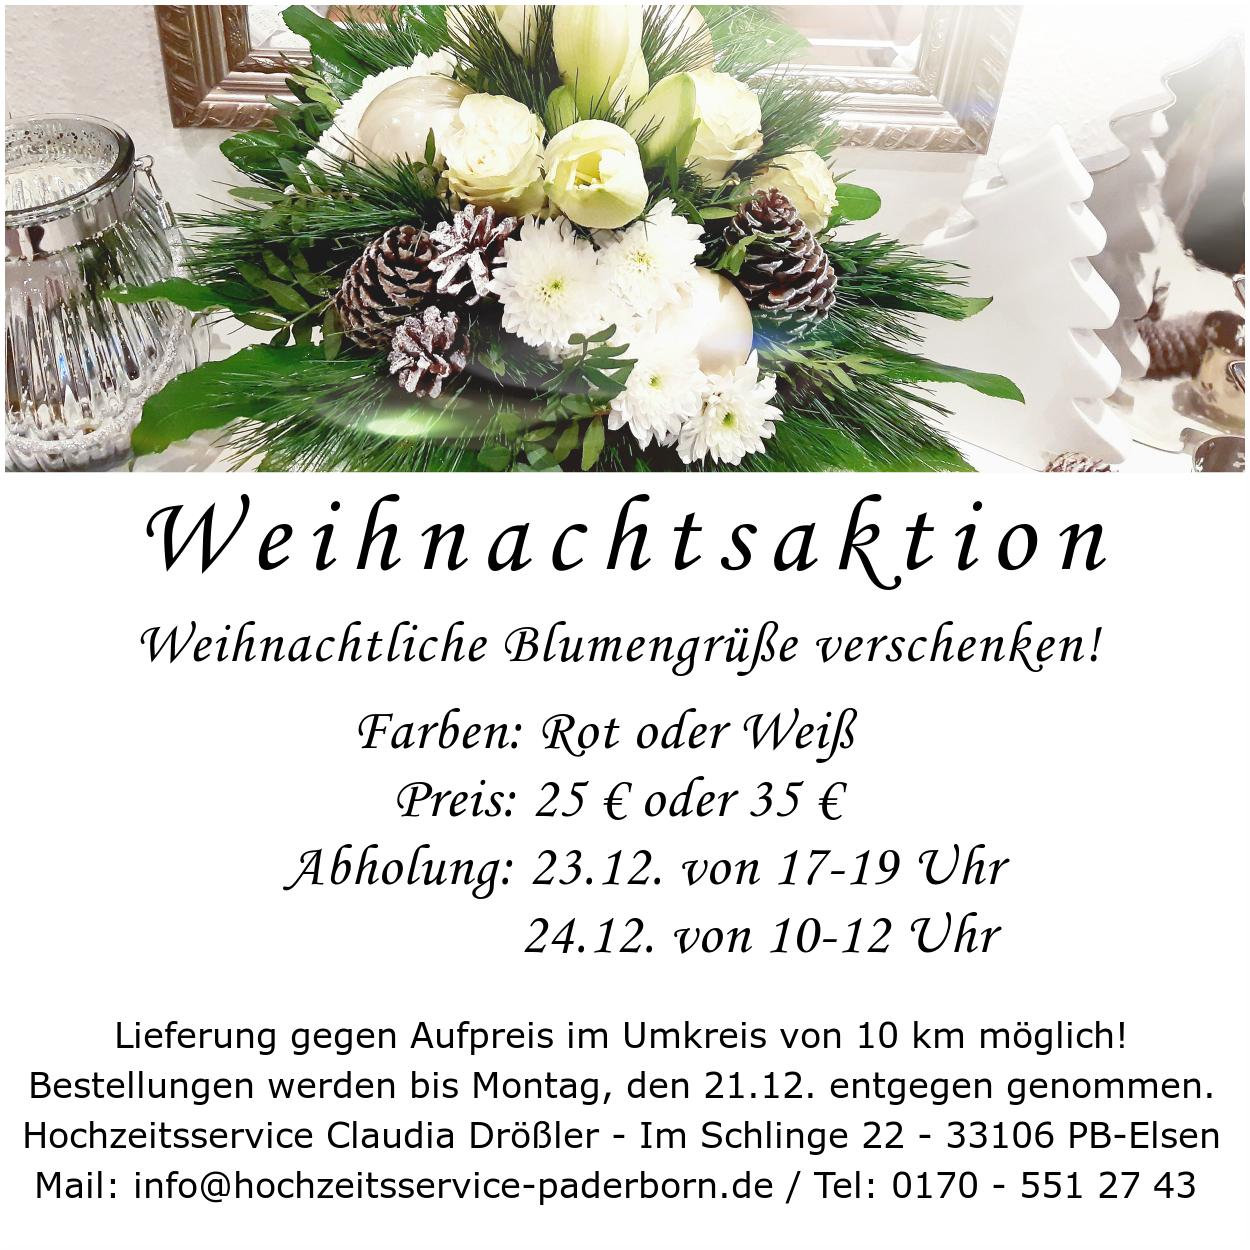 Weihnachtsaktion Hochzeitsservice Claudia Drößler, Weddingplanerin, Floristik, Paderborn,